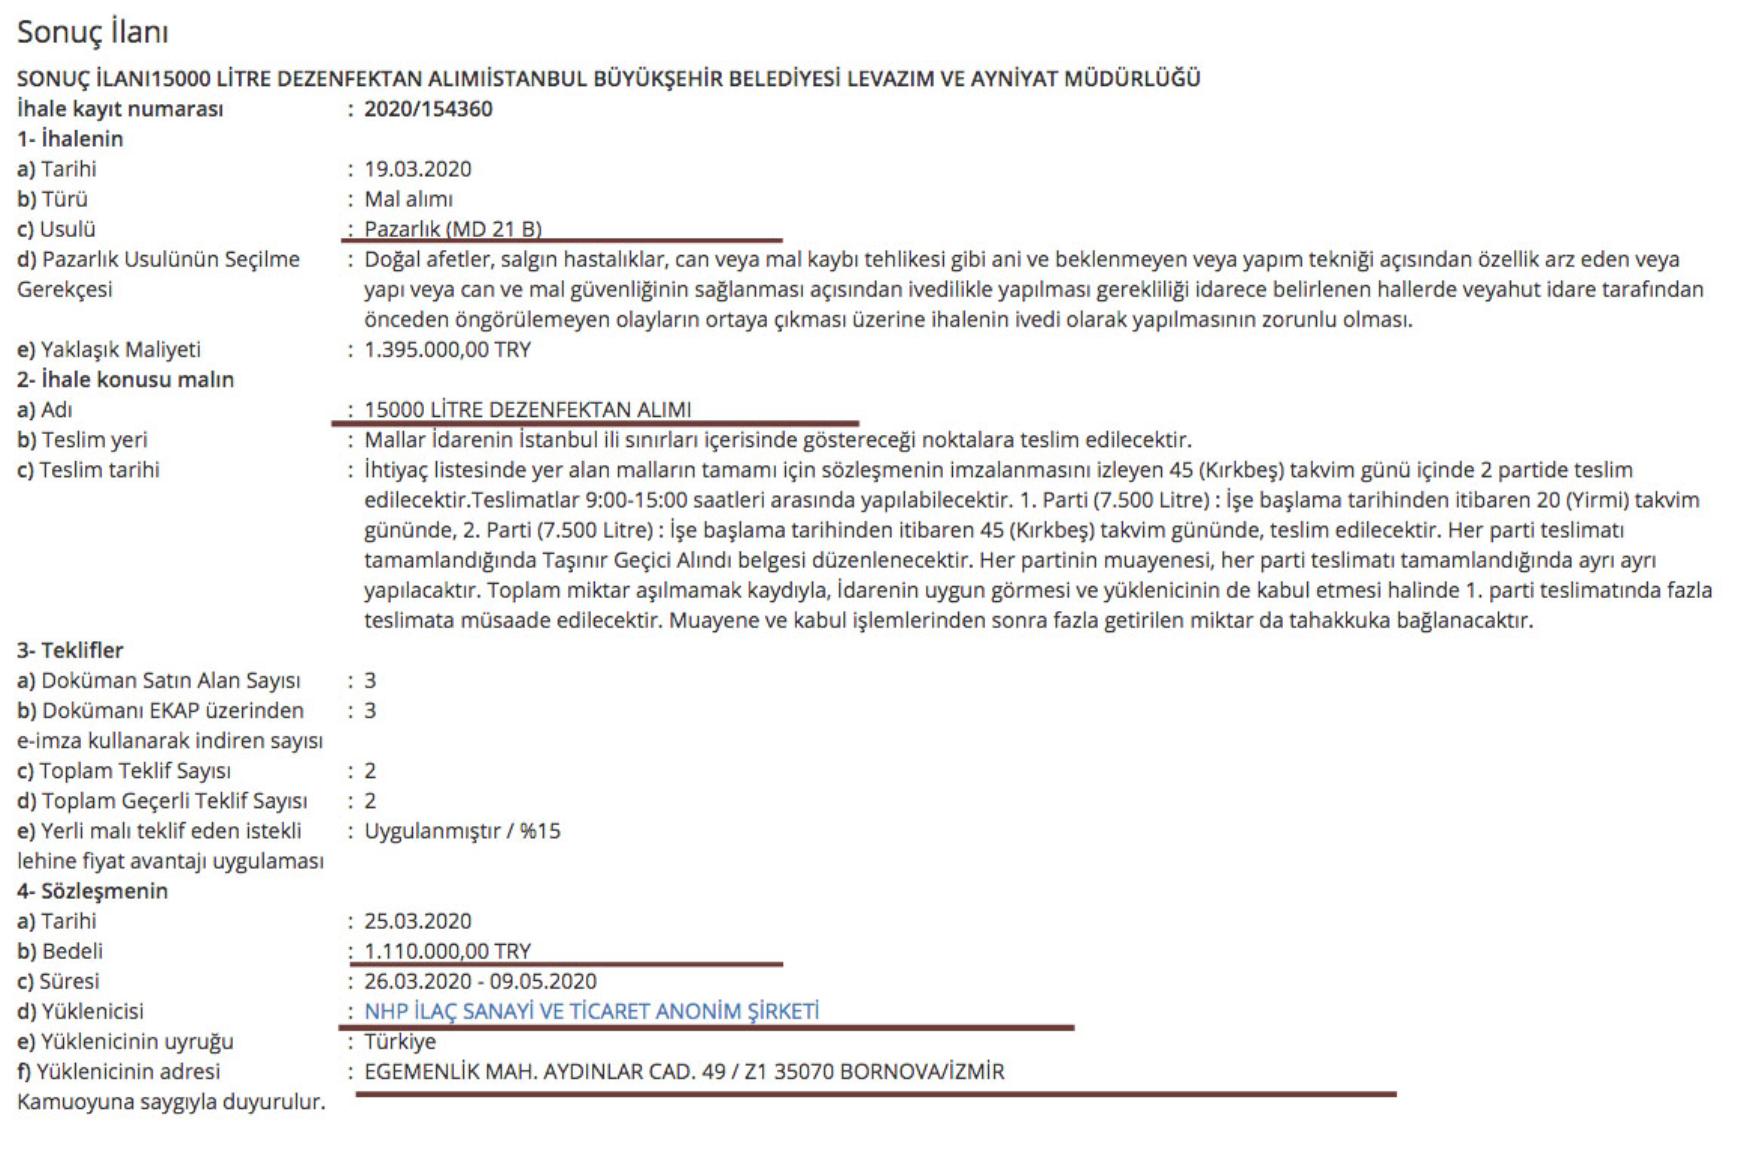 imamoglu-dezenfektan-copy.jpg